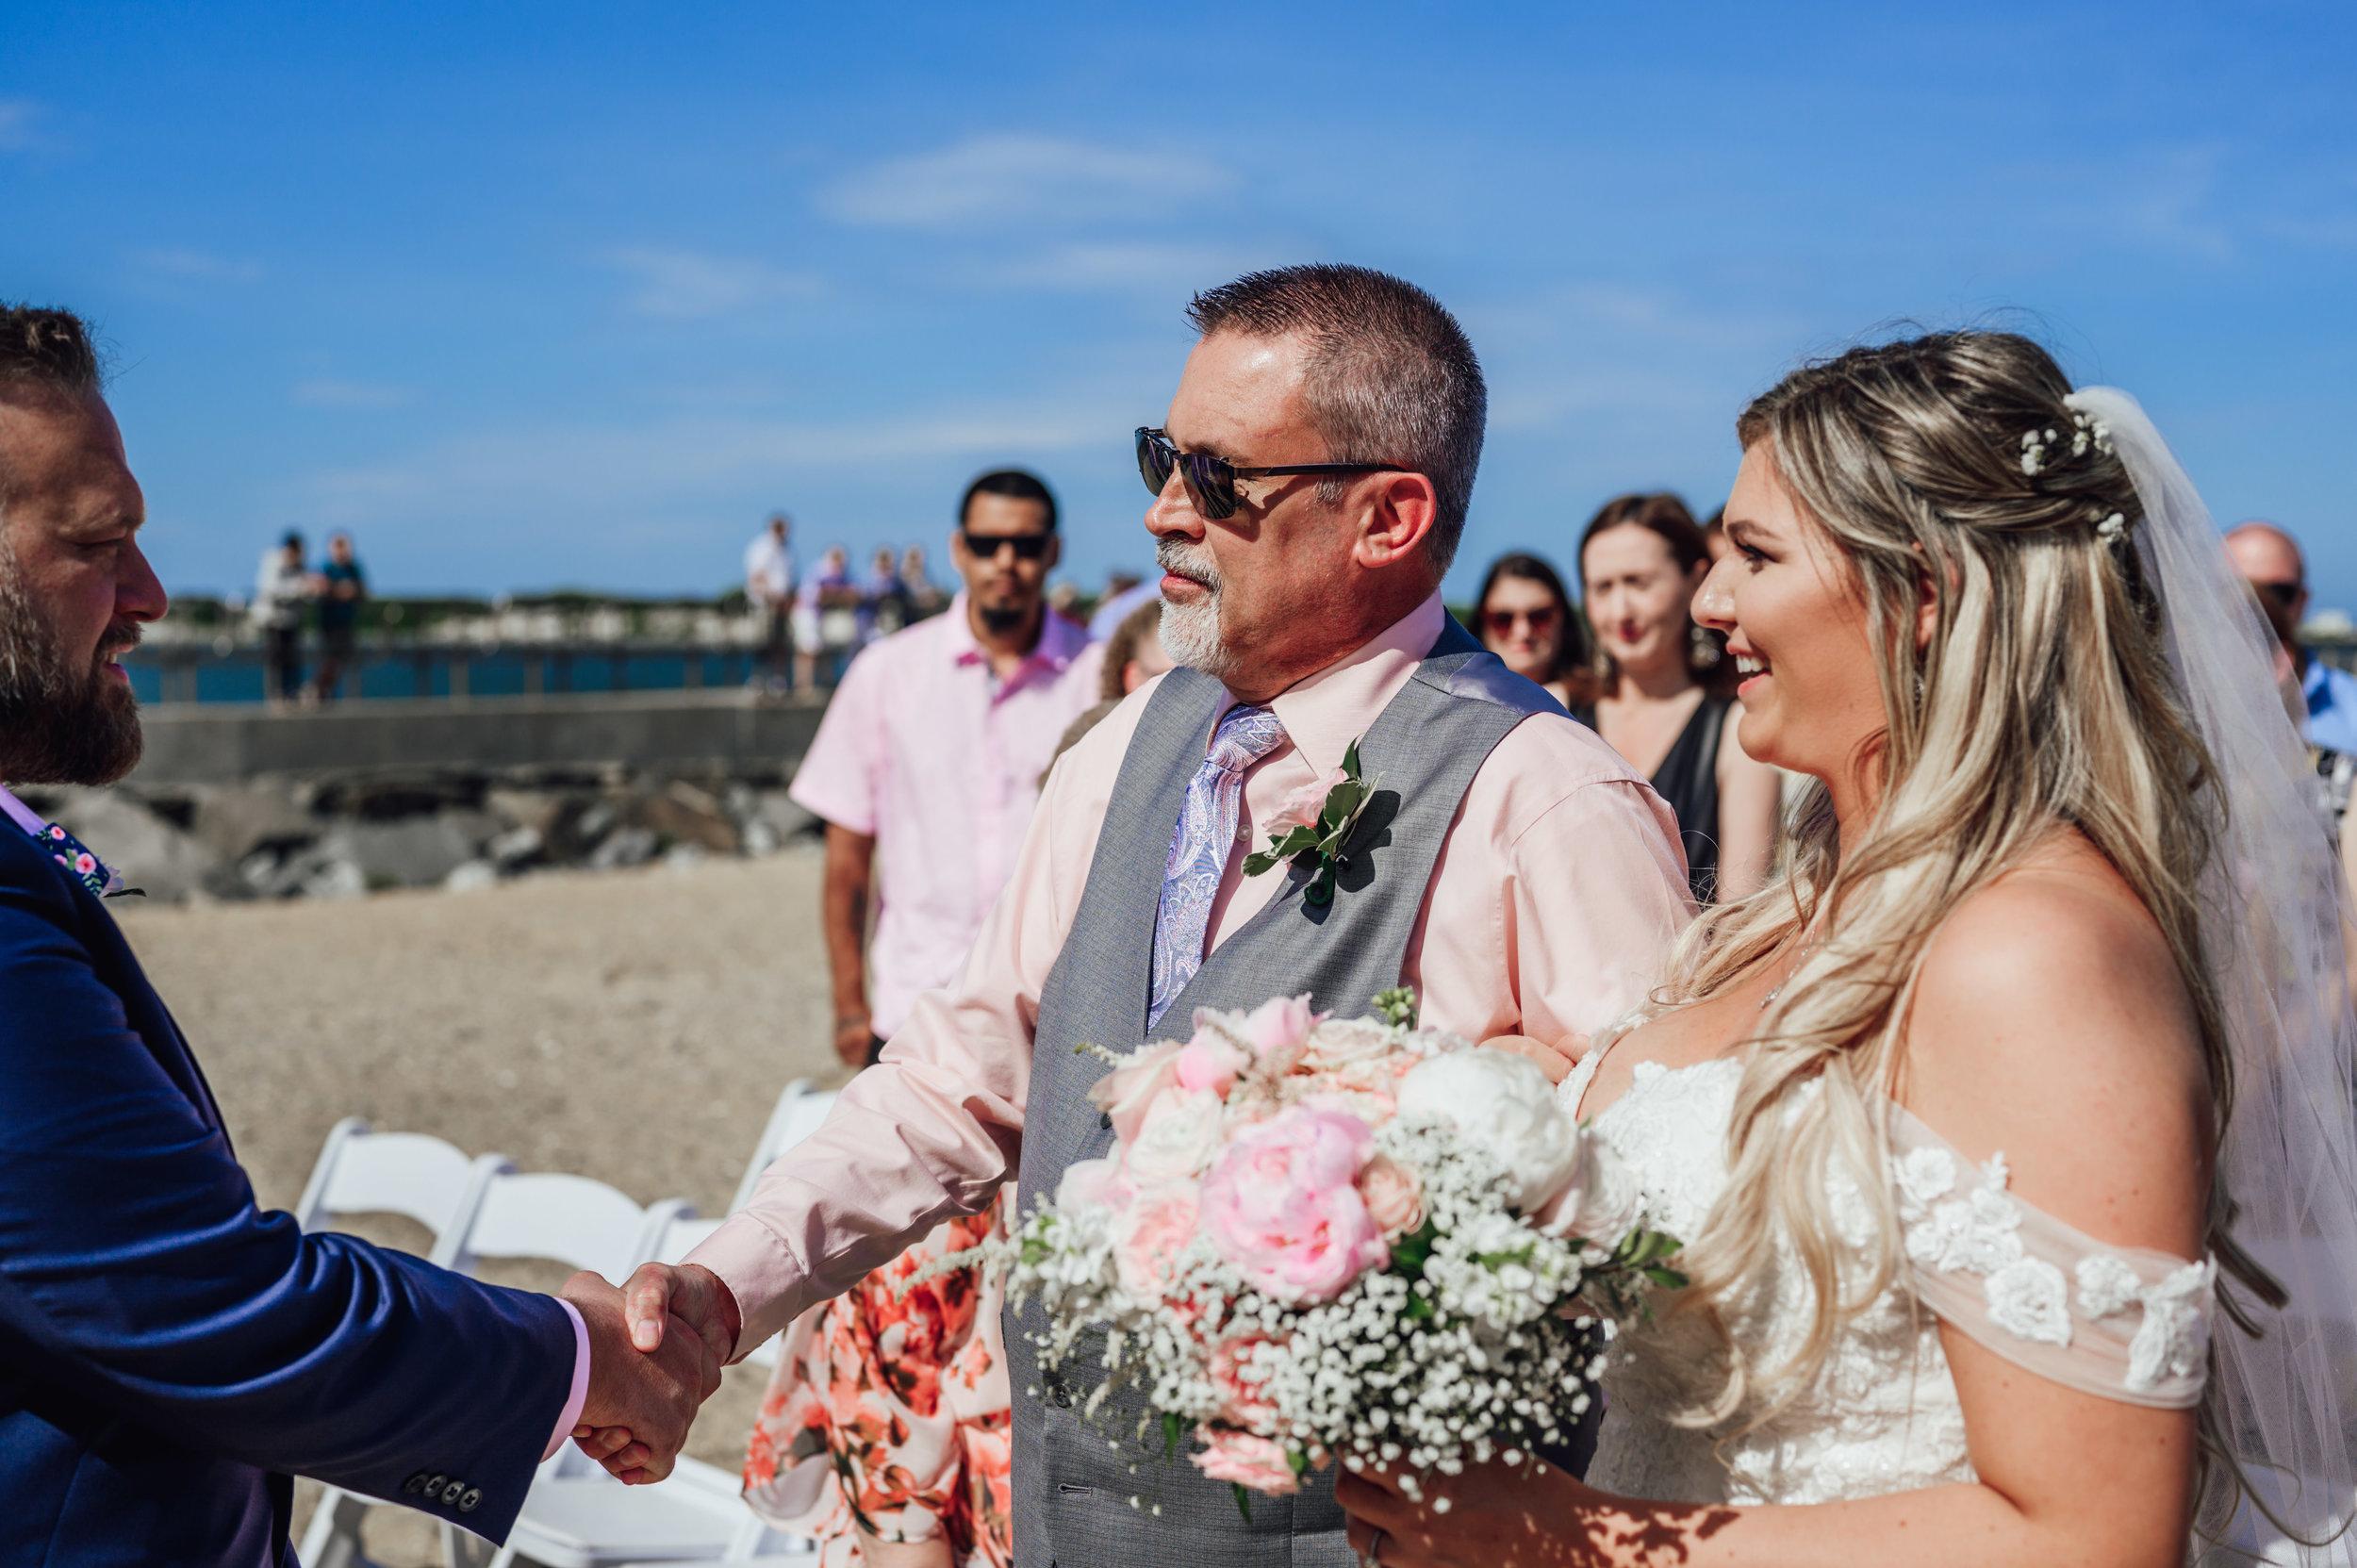 New Jersey Wedding Photographer, Felsberg Photography LBI wedding photography 64.jpg